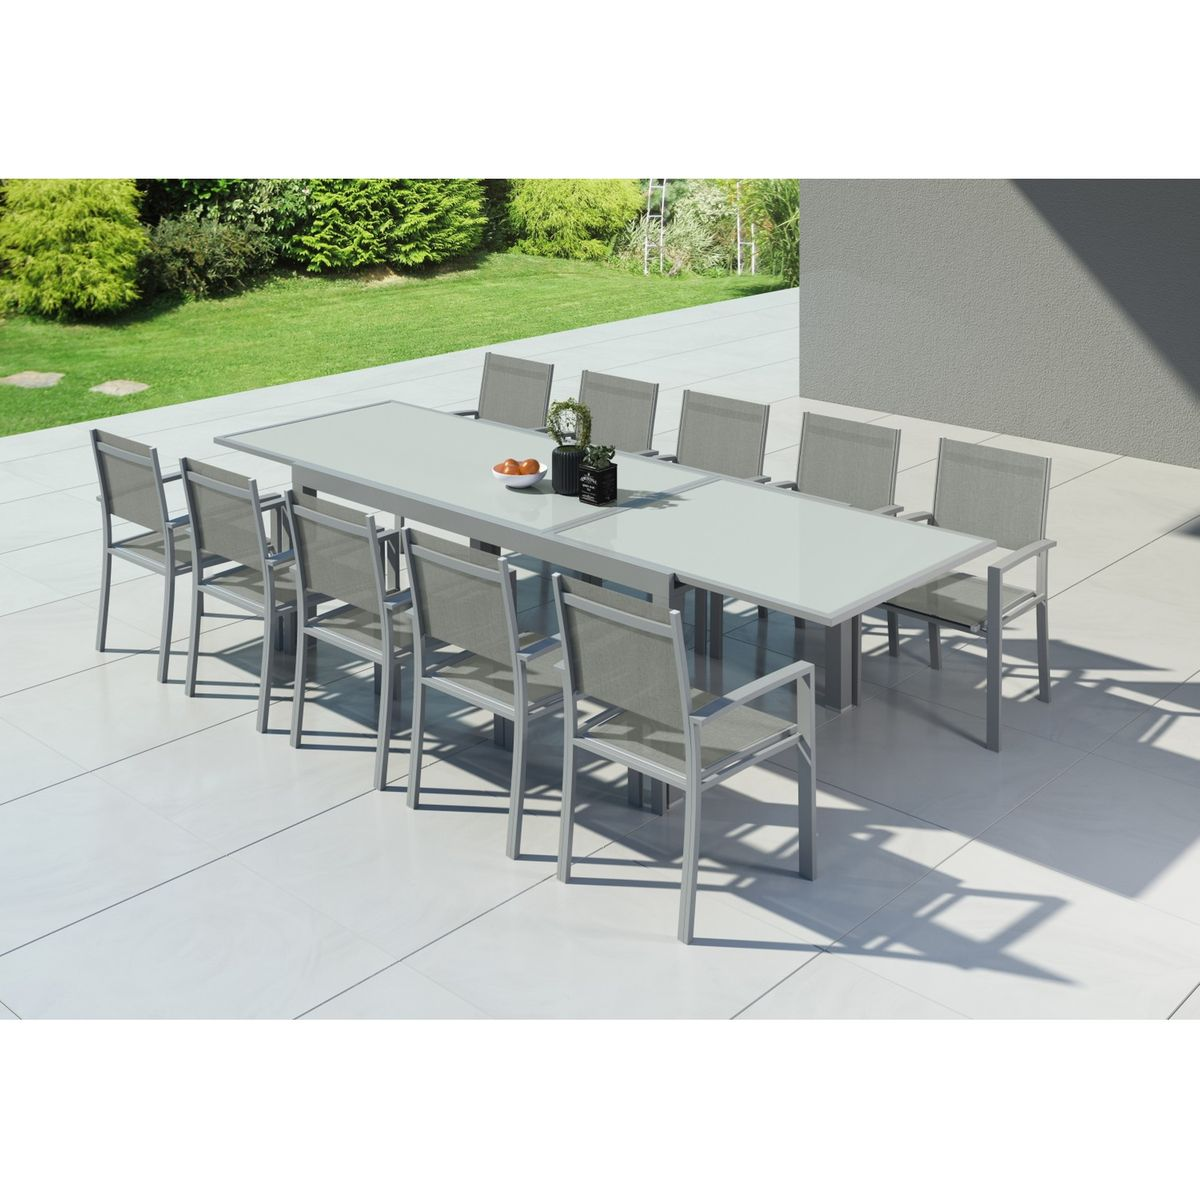 Table de jardin extensible, aluminium, 200/320cm, 10 ...